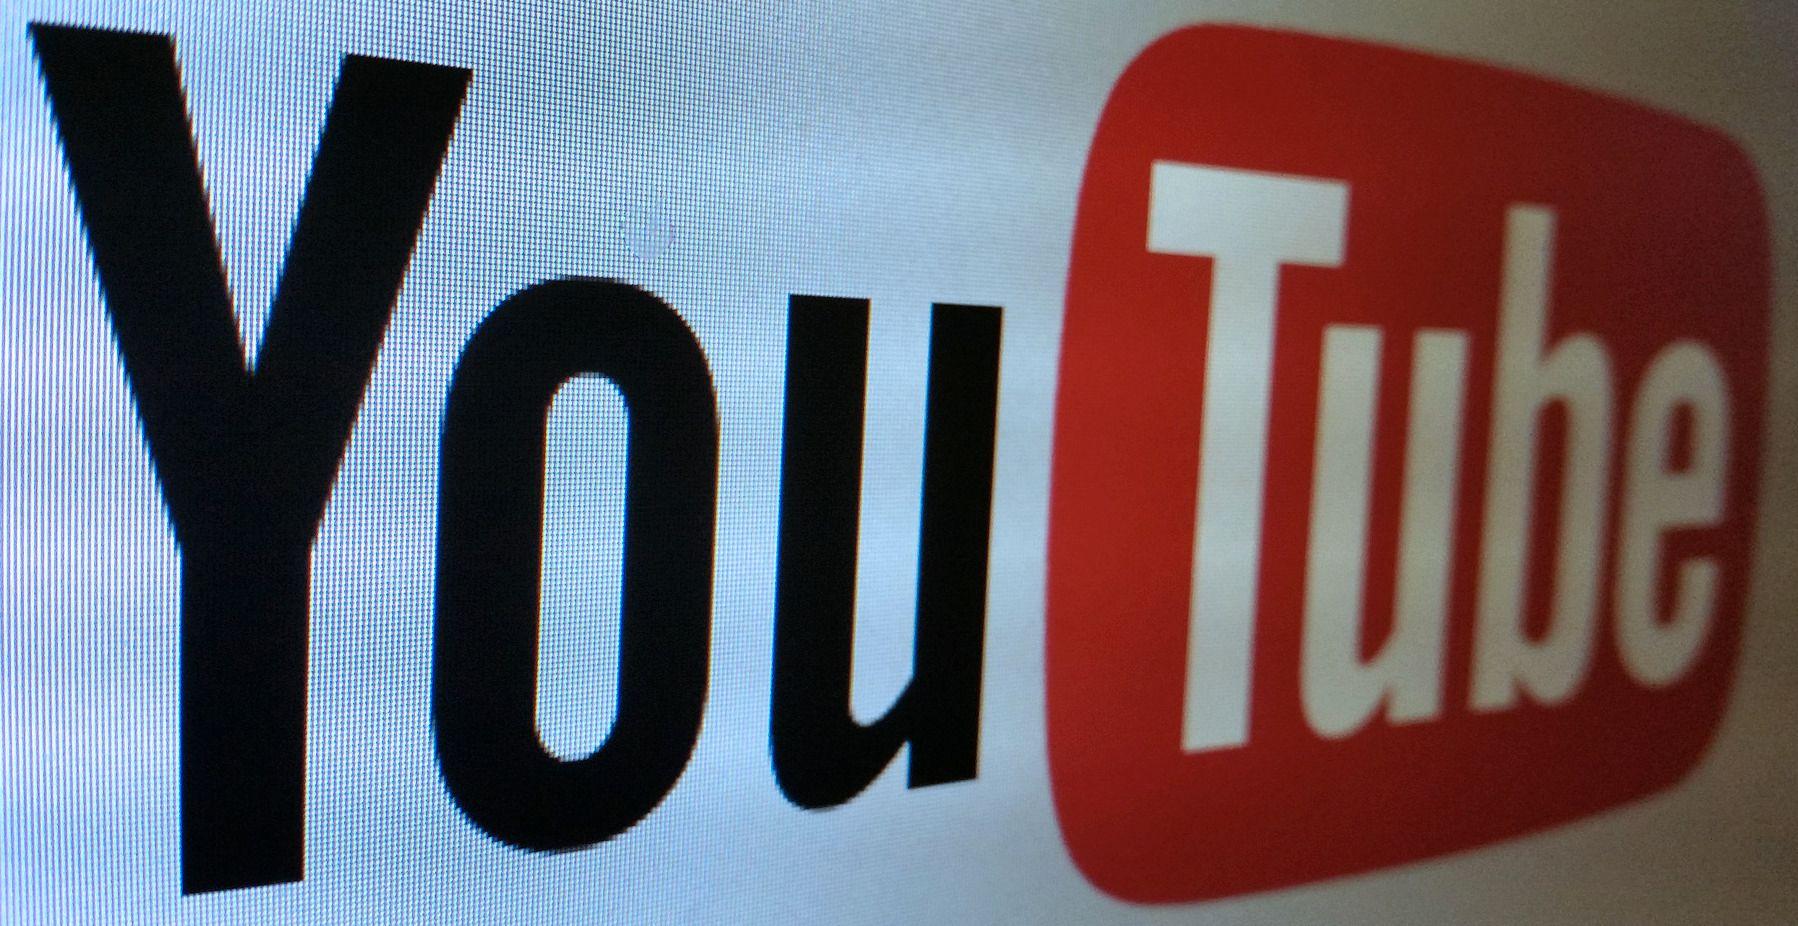 YouTube vil annonsere betaltjeneste i morgen